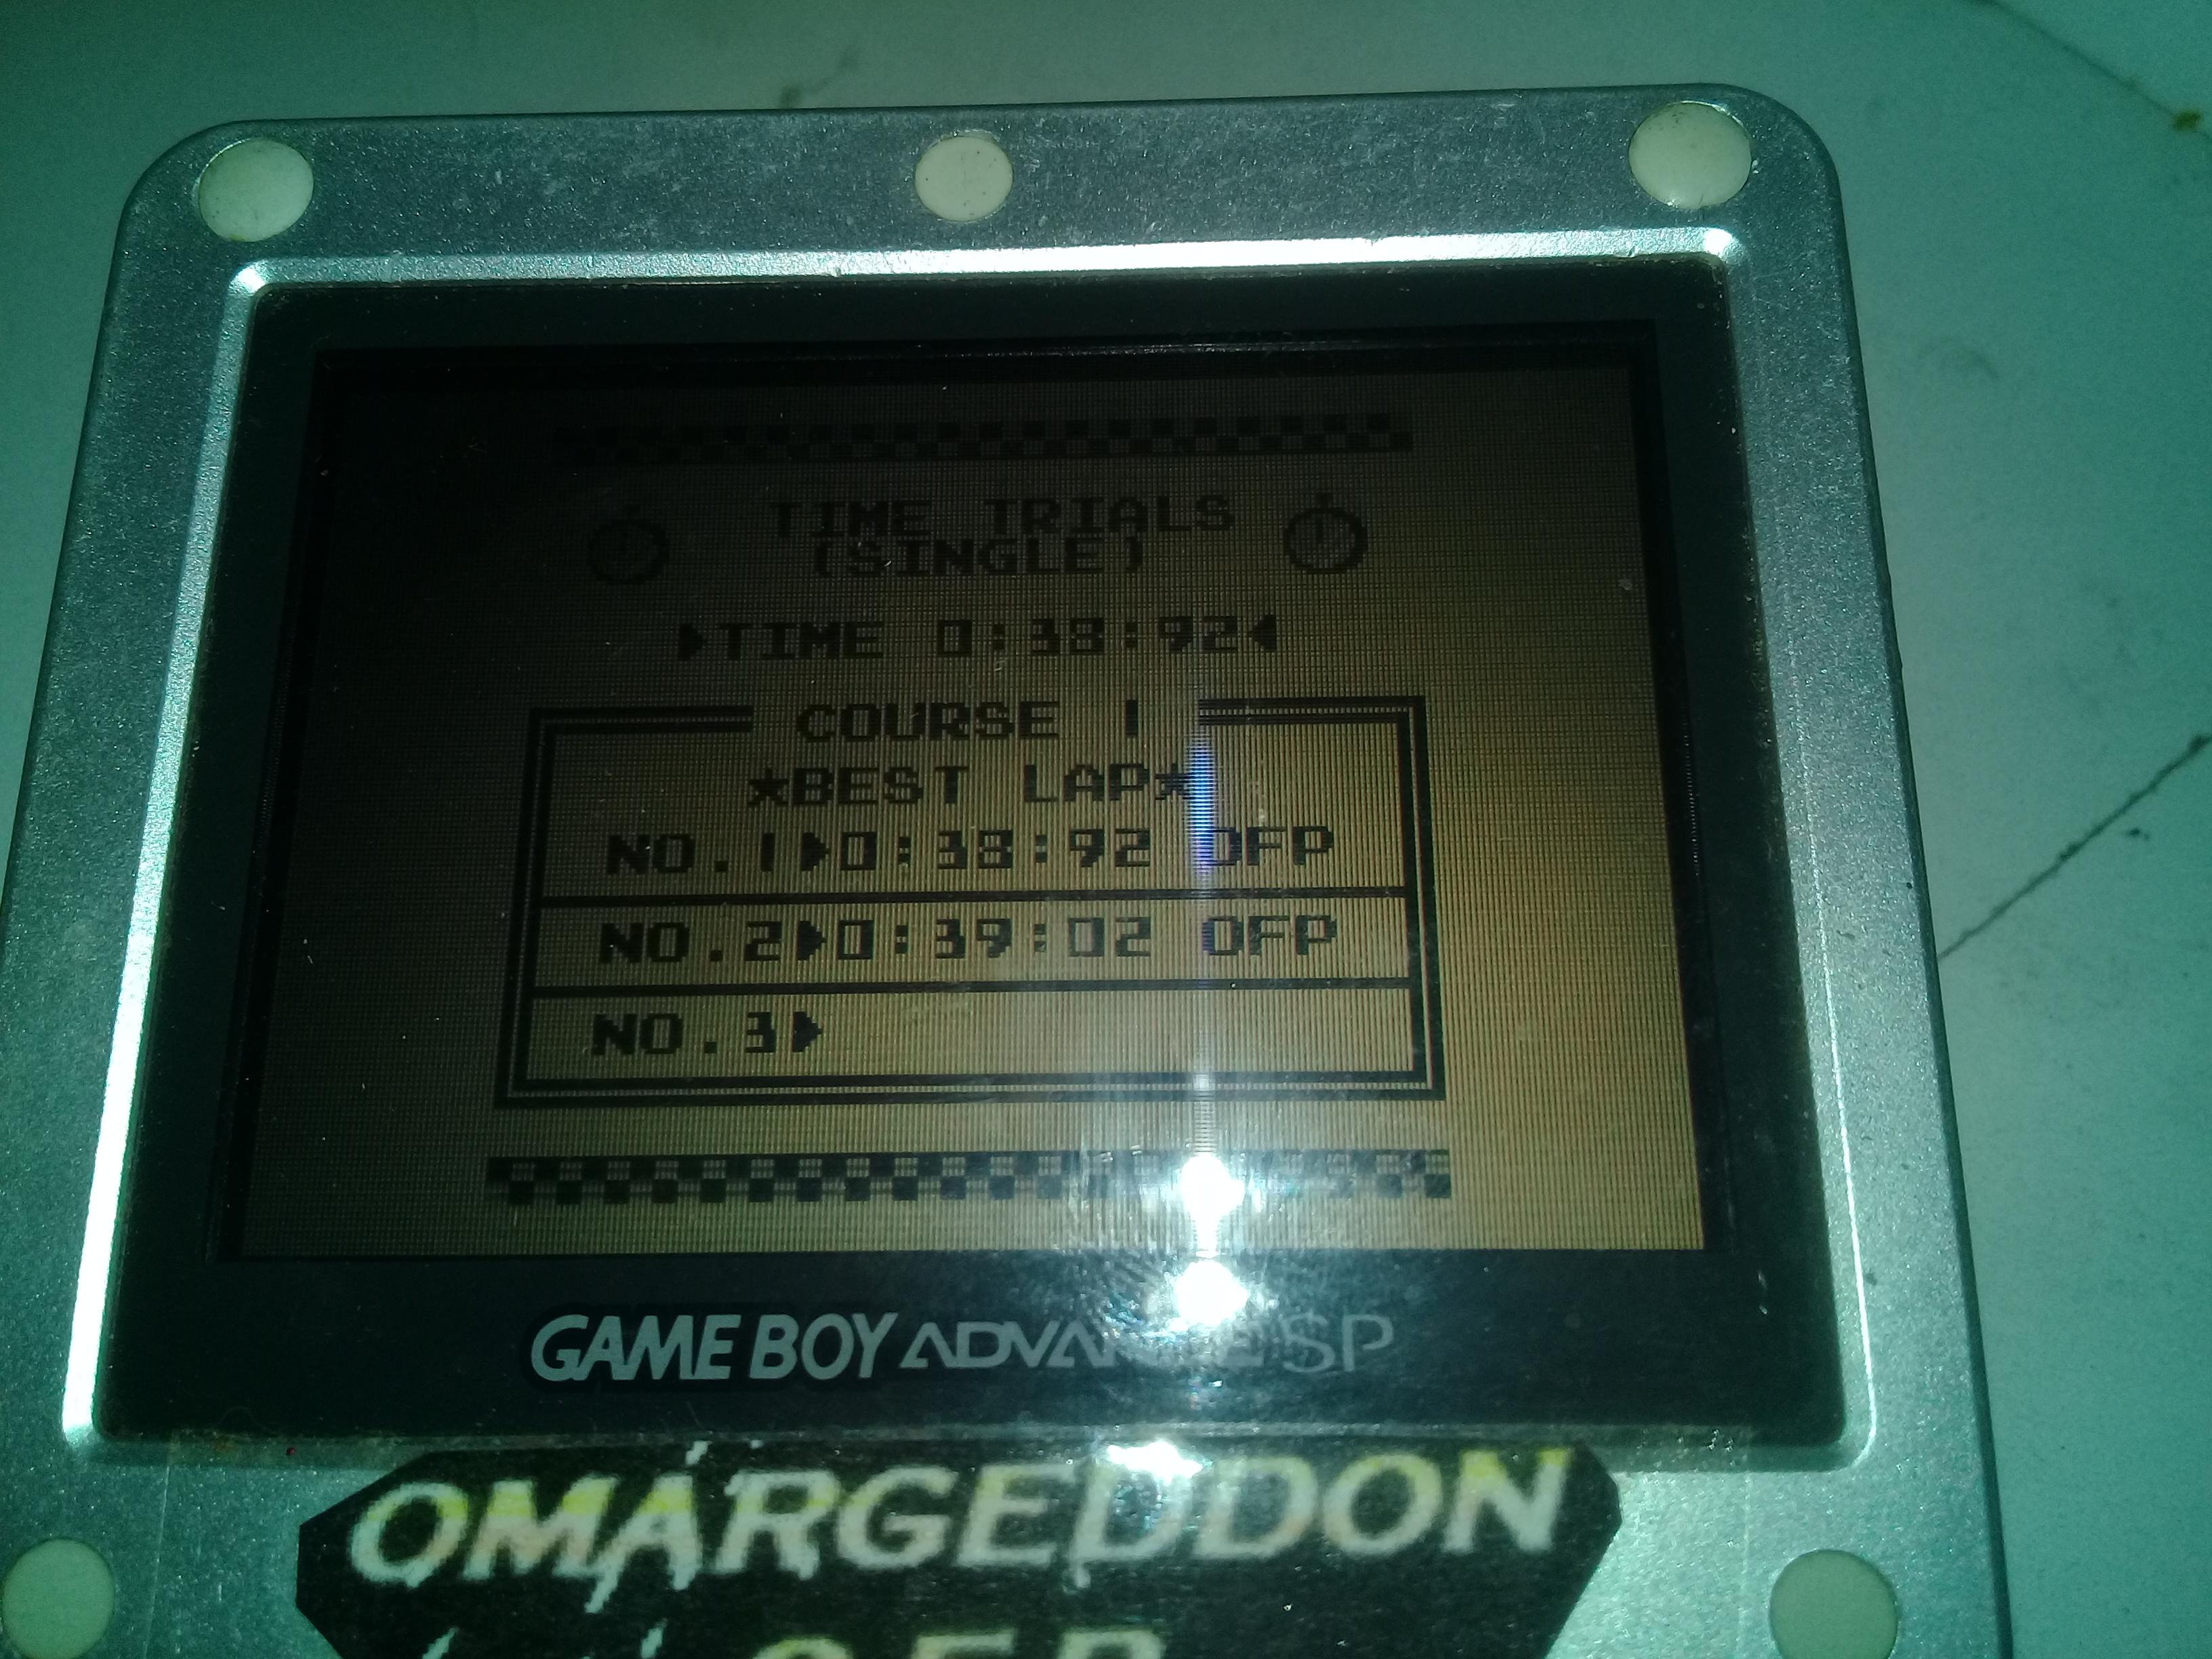 omargeddon: F-1 Race: Time Trials: Single: Australia [Best Lap] (Game Boy) 0:00:38.92 points on 2019-04-19 20:13:08